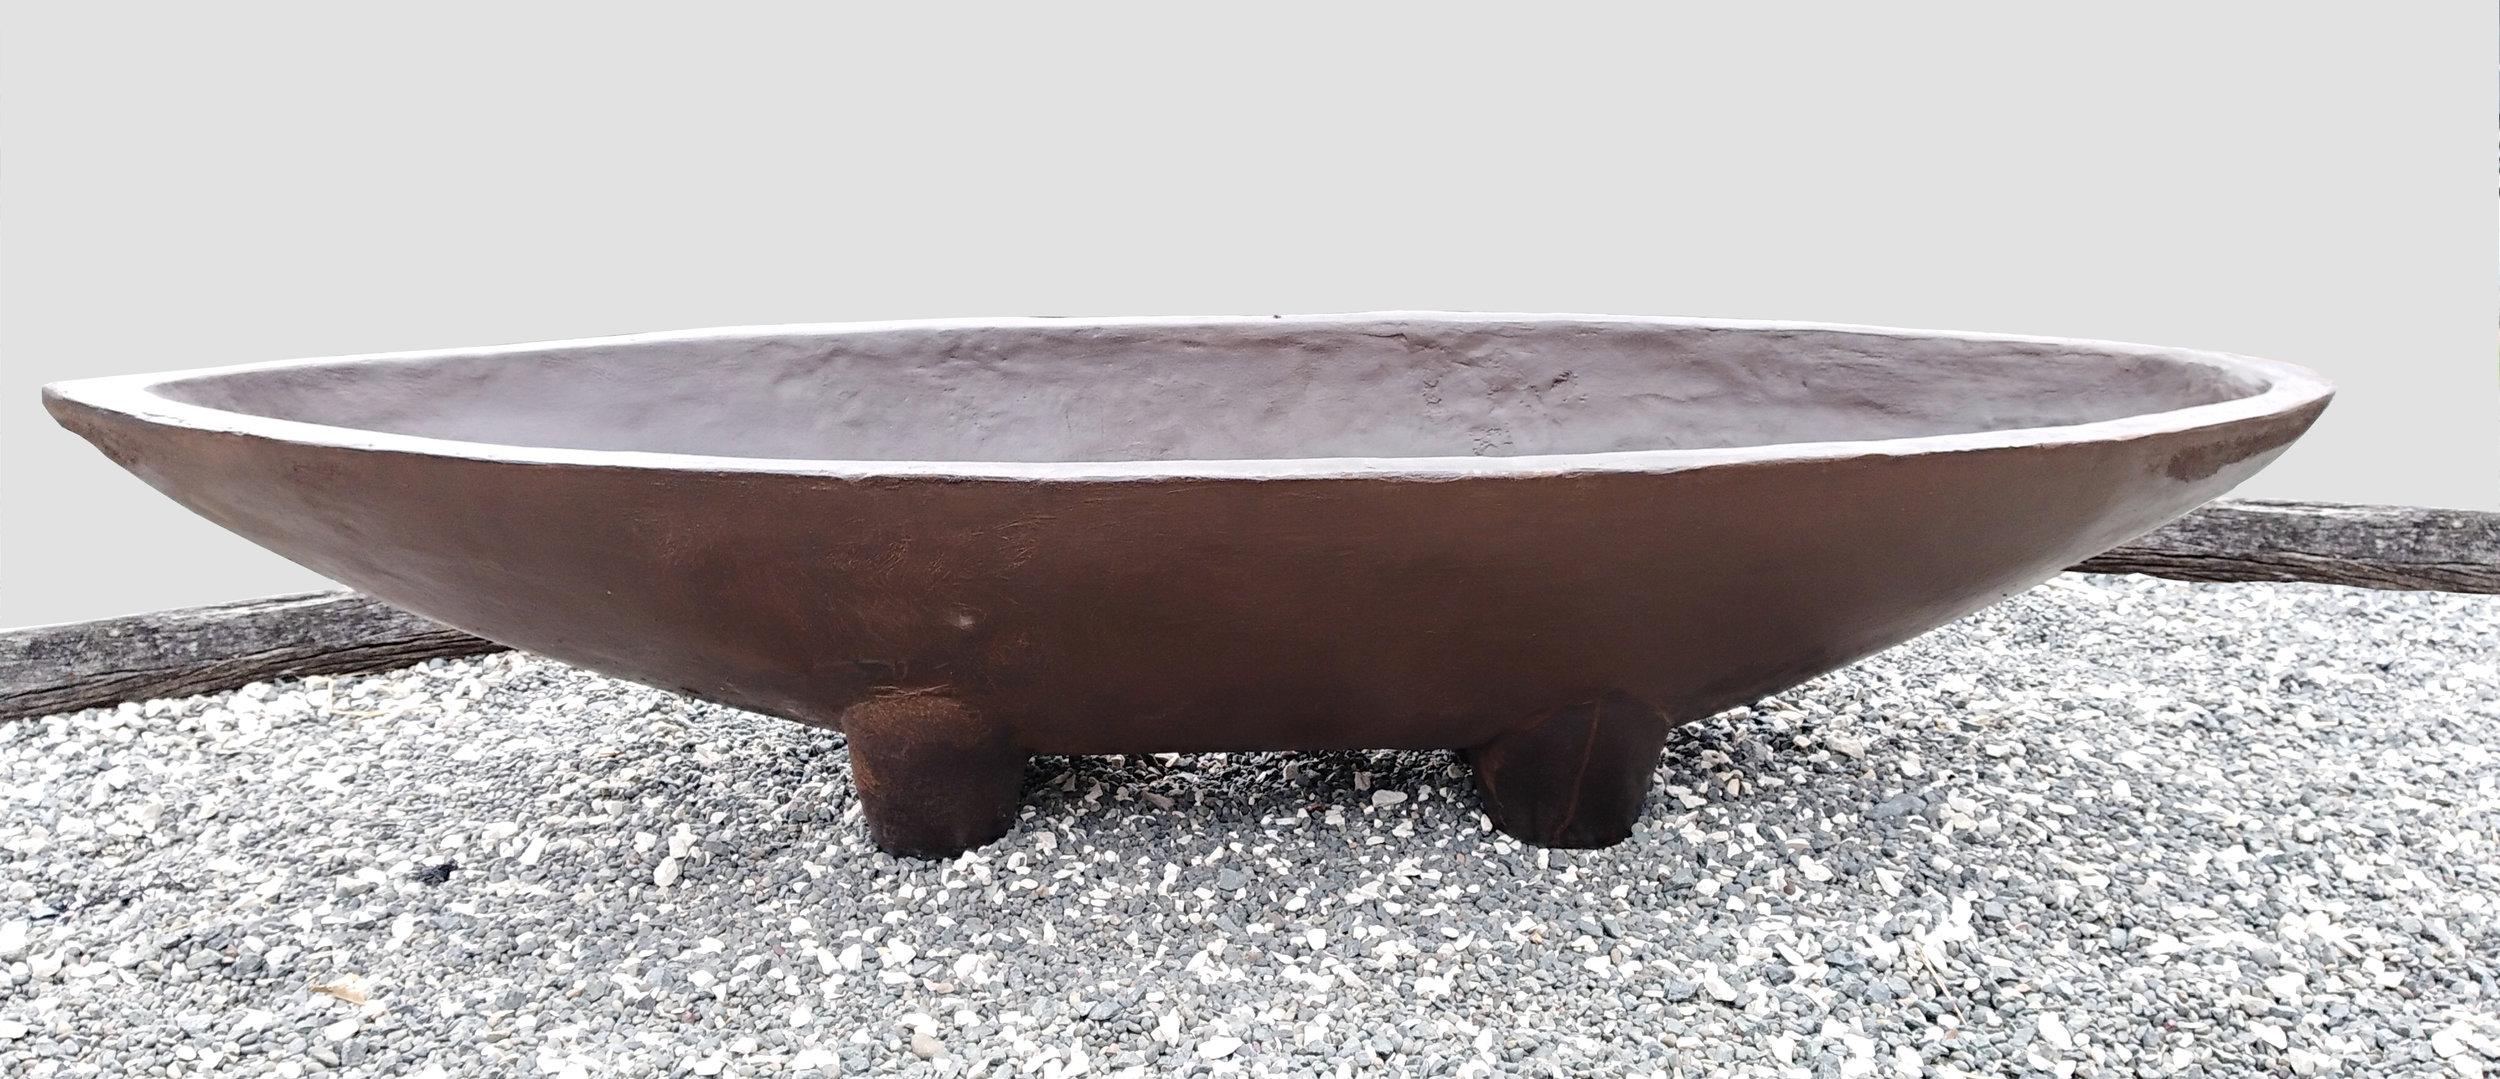 Waka  John Phillips, artis fiberclay, free-standing indoor/outdoor sculpture (has drainage plug), 1900mm L x 345mm H x 680mm W  $850.00